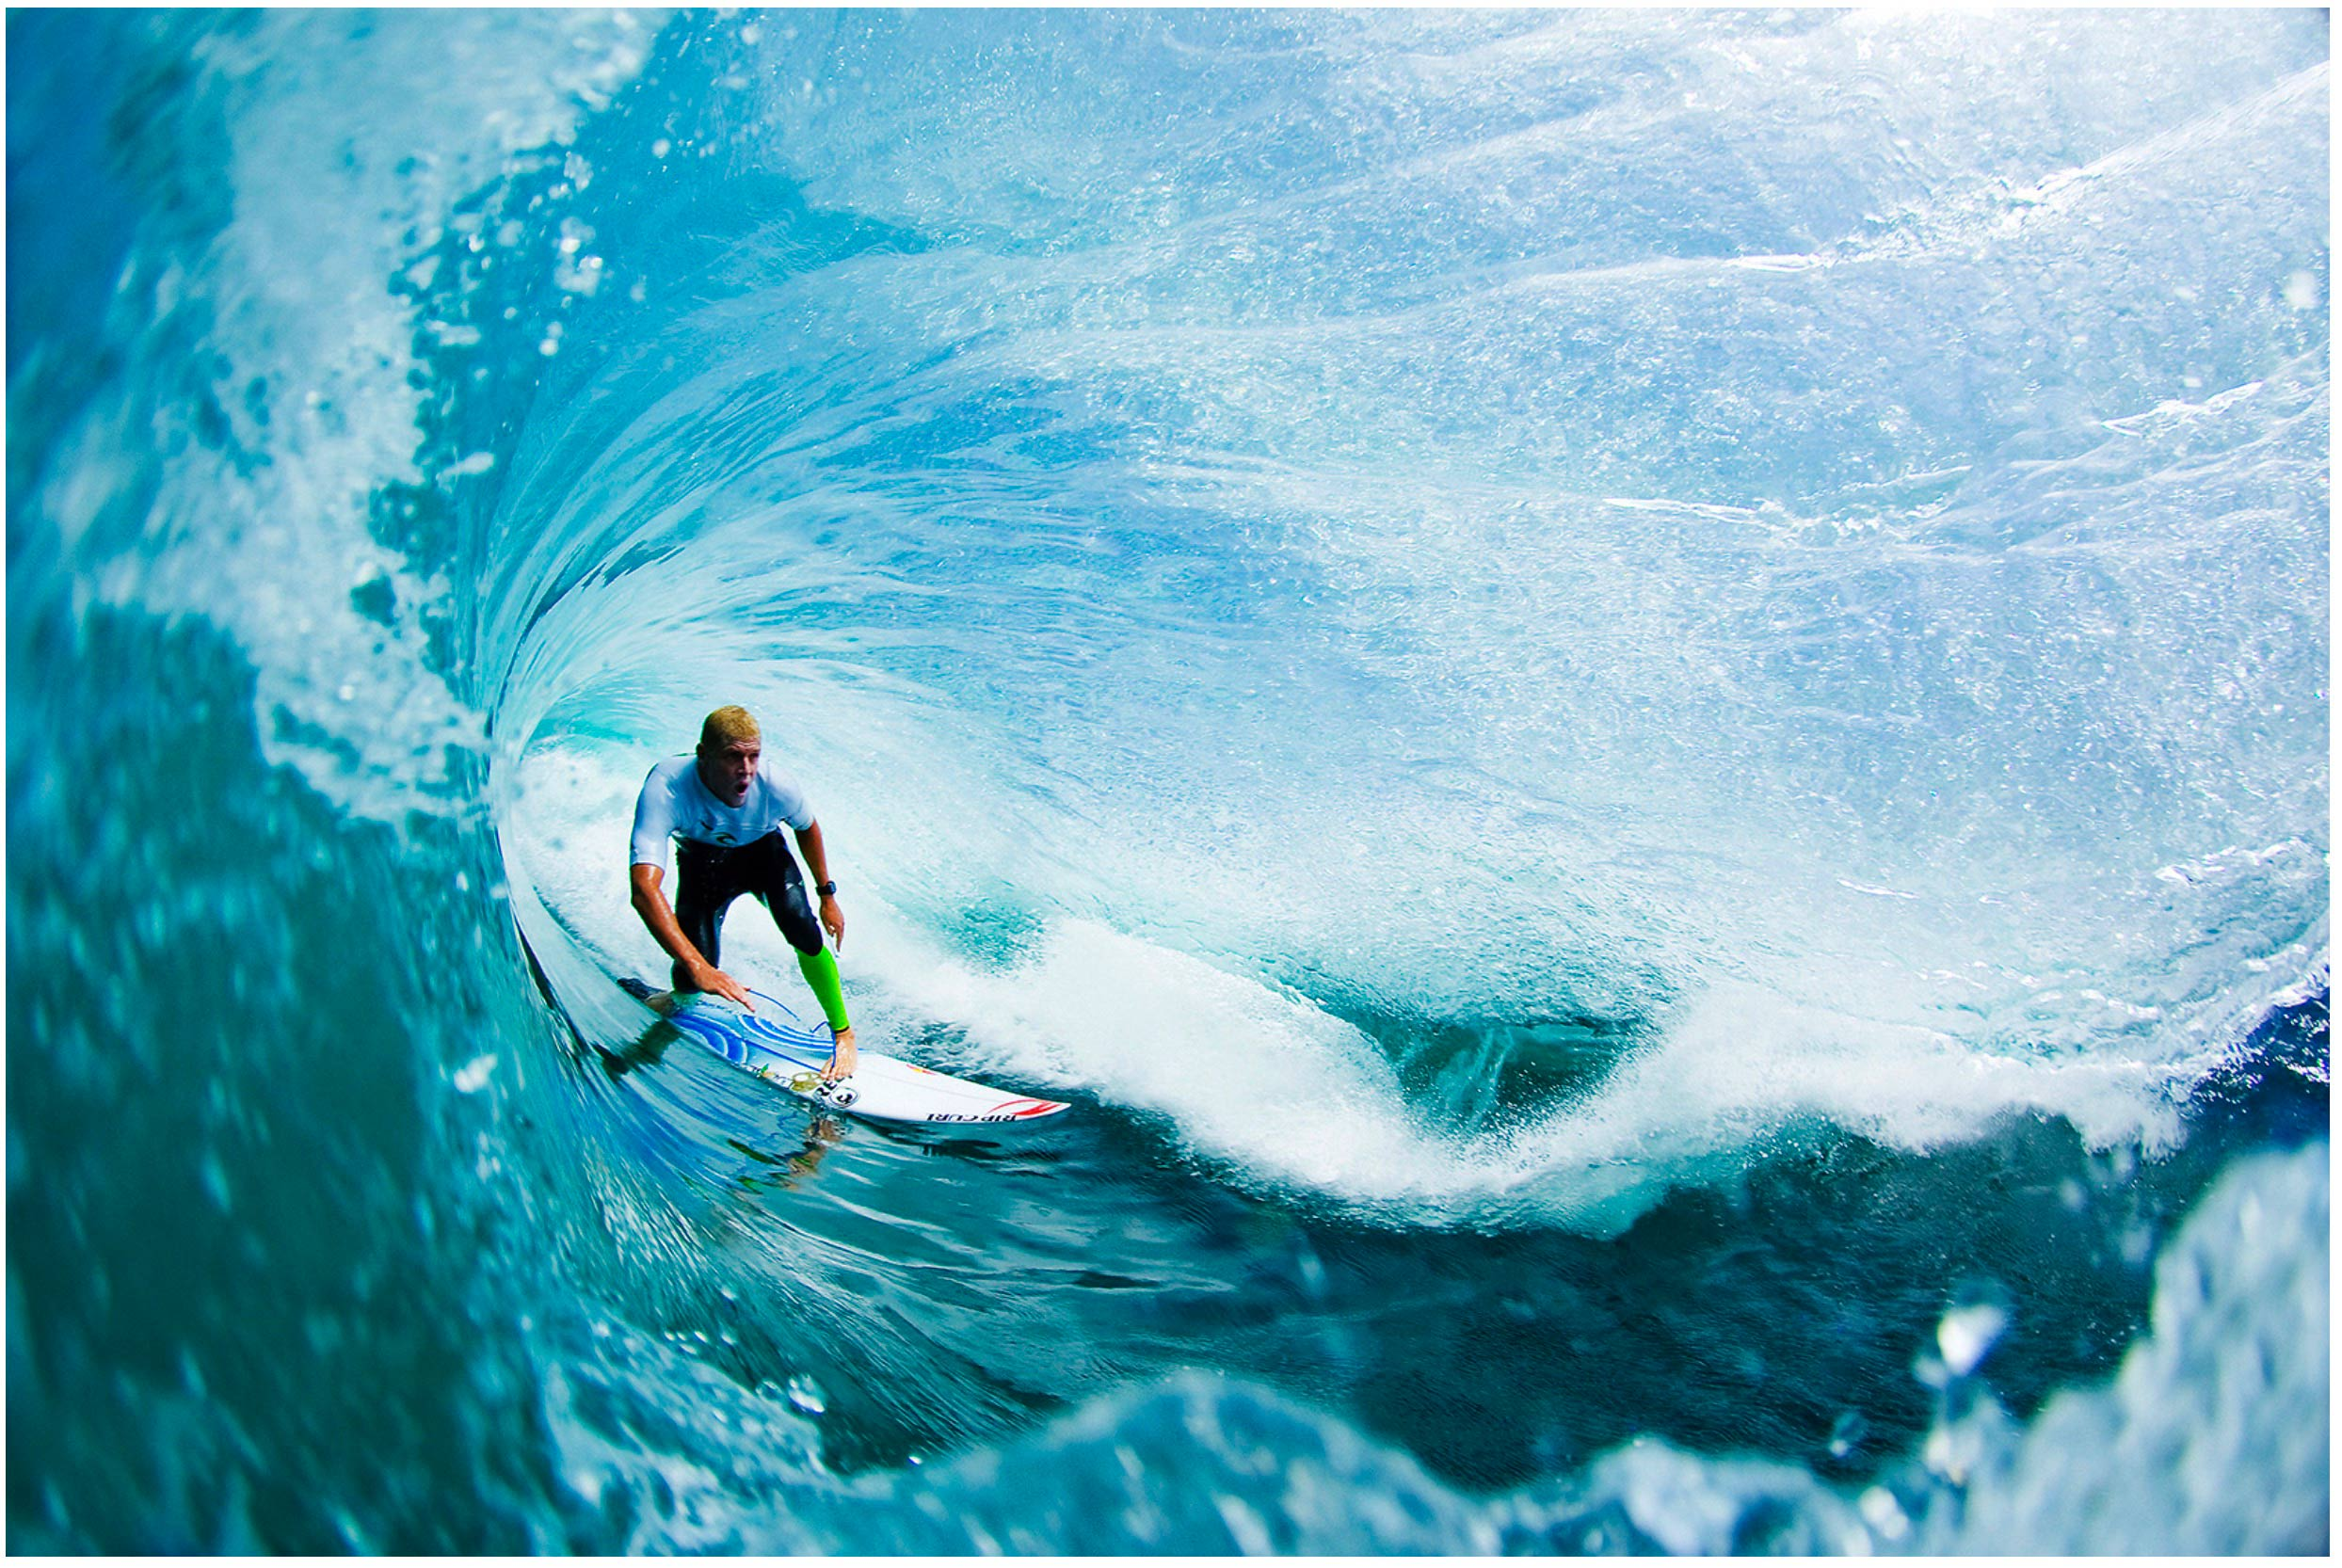 rodd-owen-surf-photography-for-sale-owenphoto-267.jpg